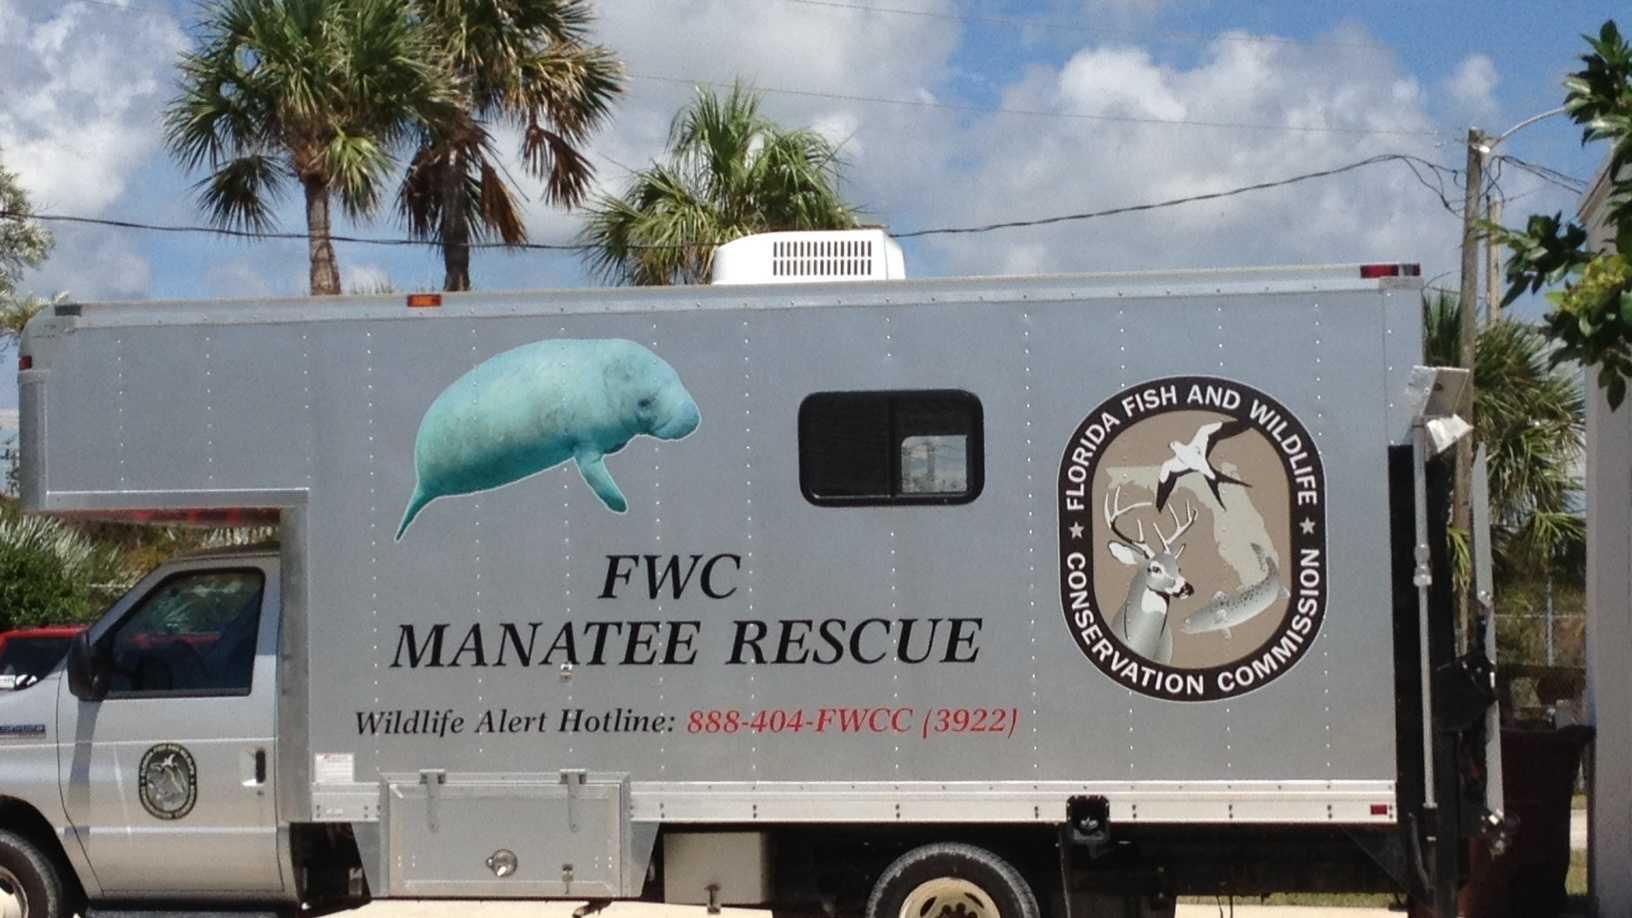 Manatee Rescue vehicle